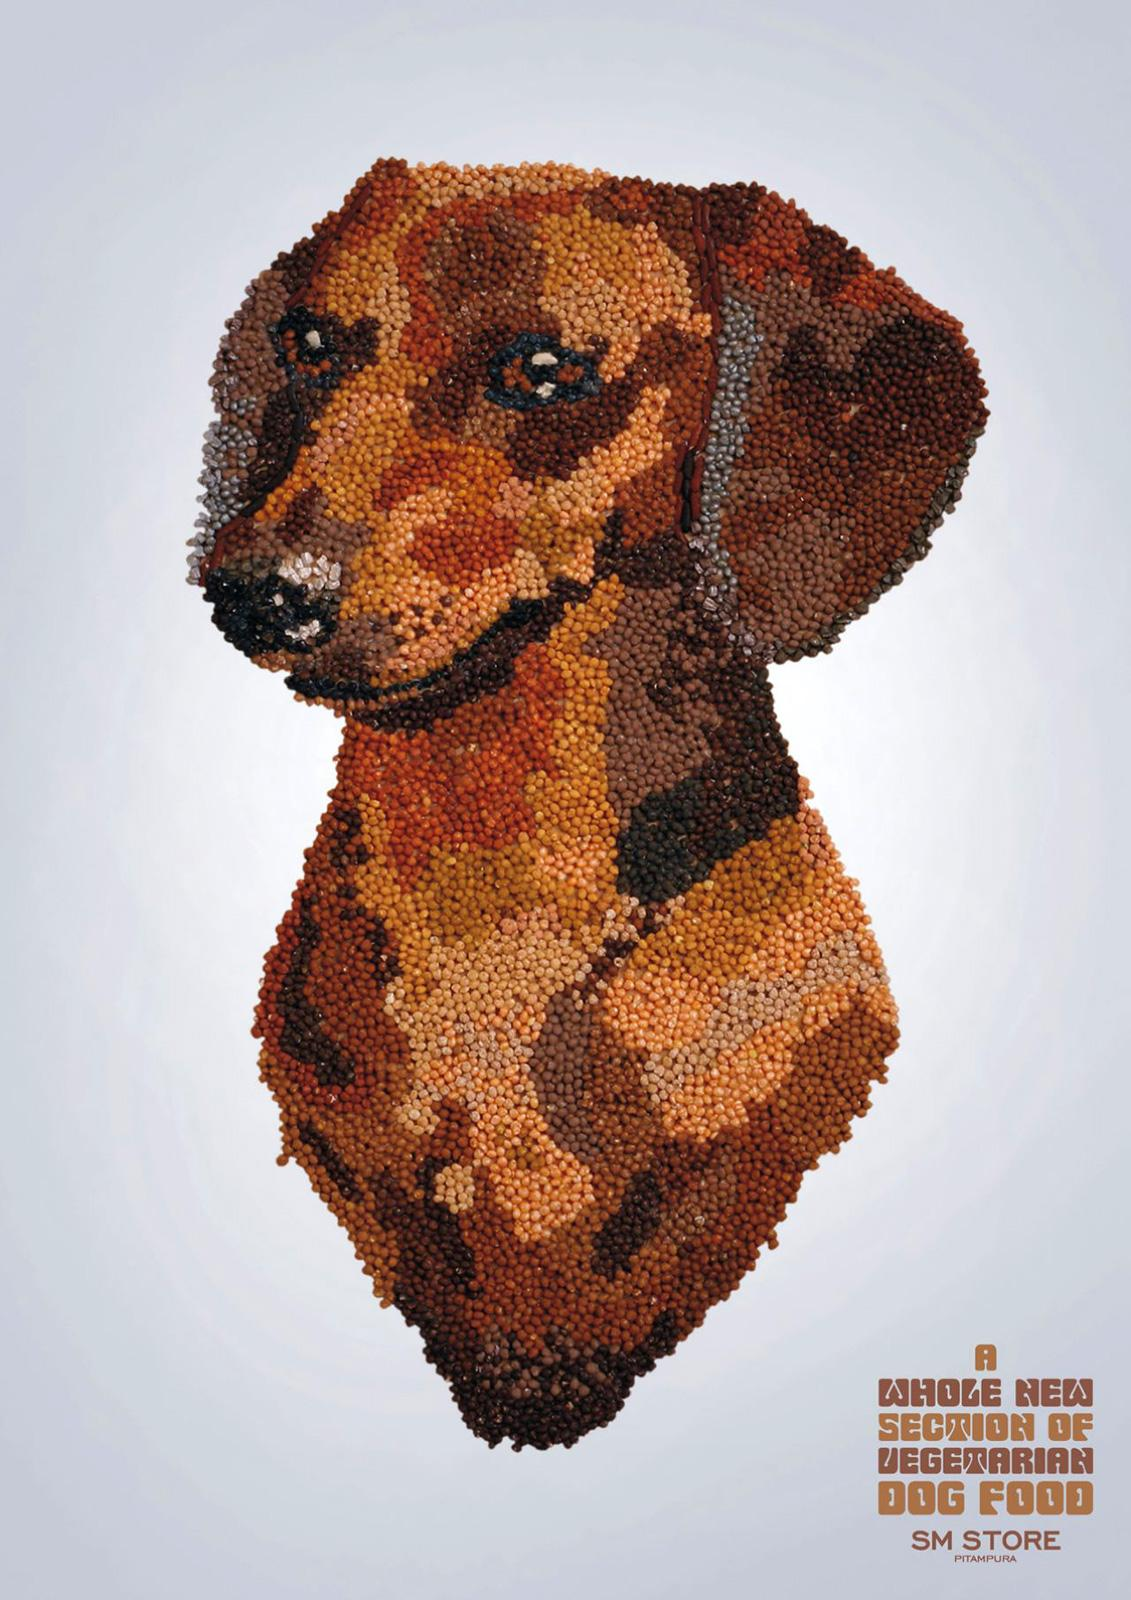 SM Store Print Ad -  Dog, 2